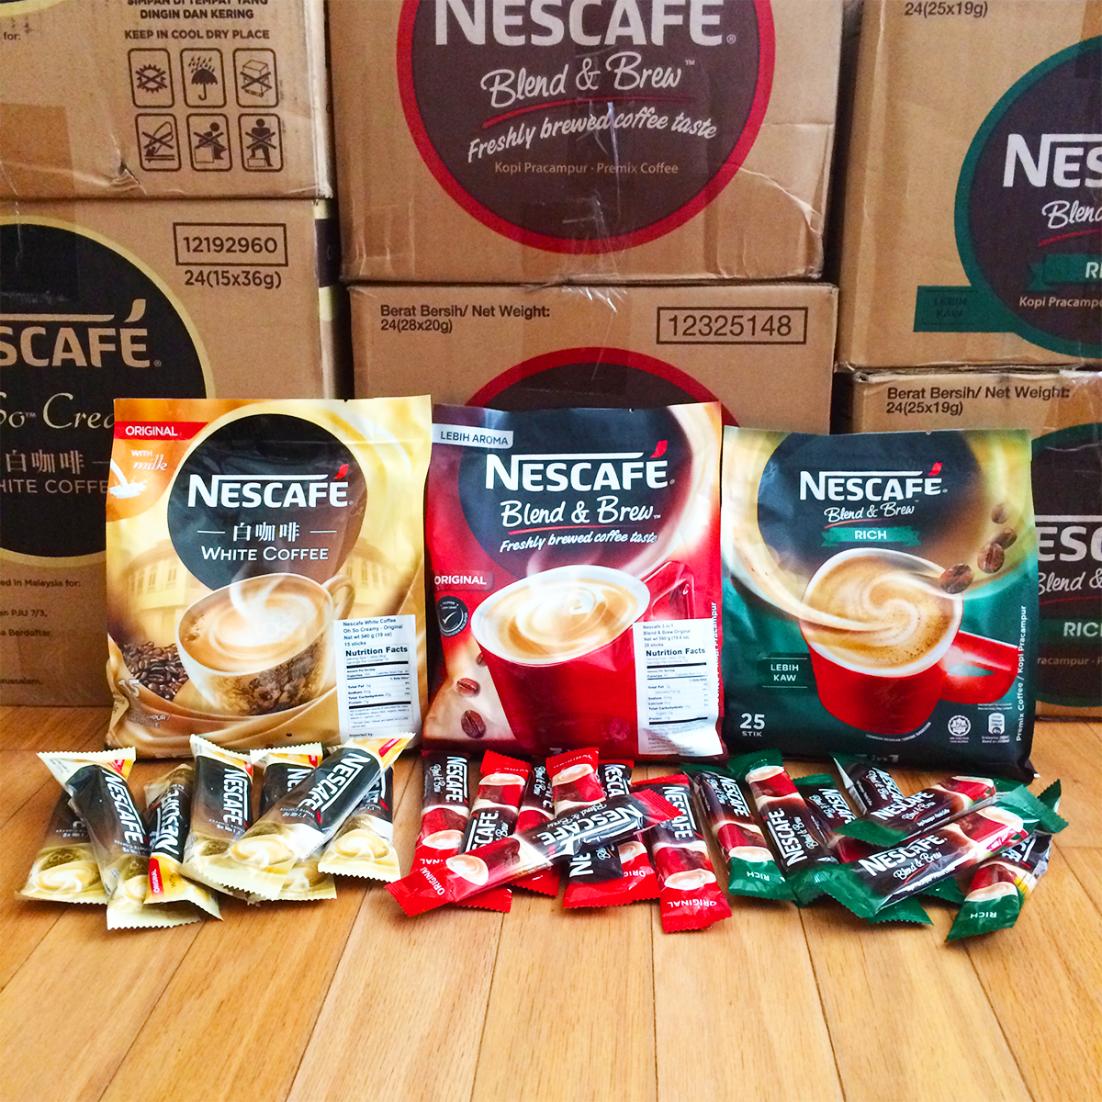 Nescafe 3in1 Original Nescafe, Coffee tasting, Coffee